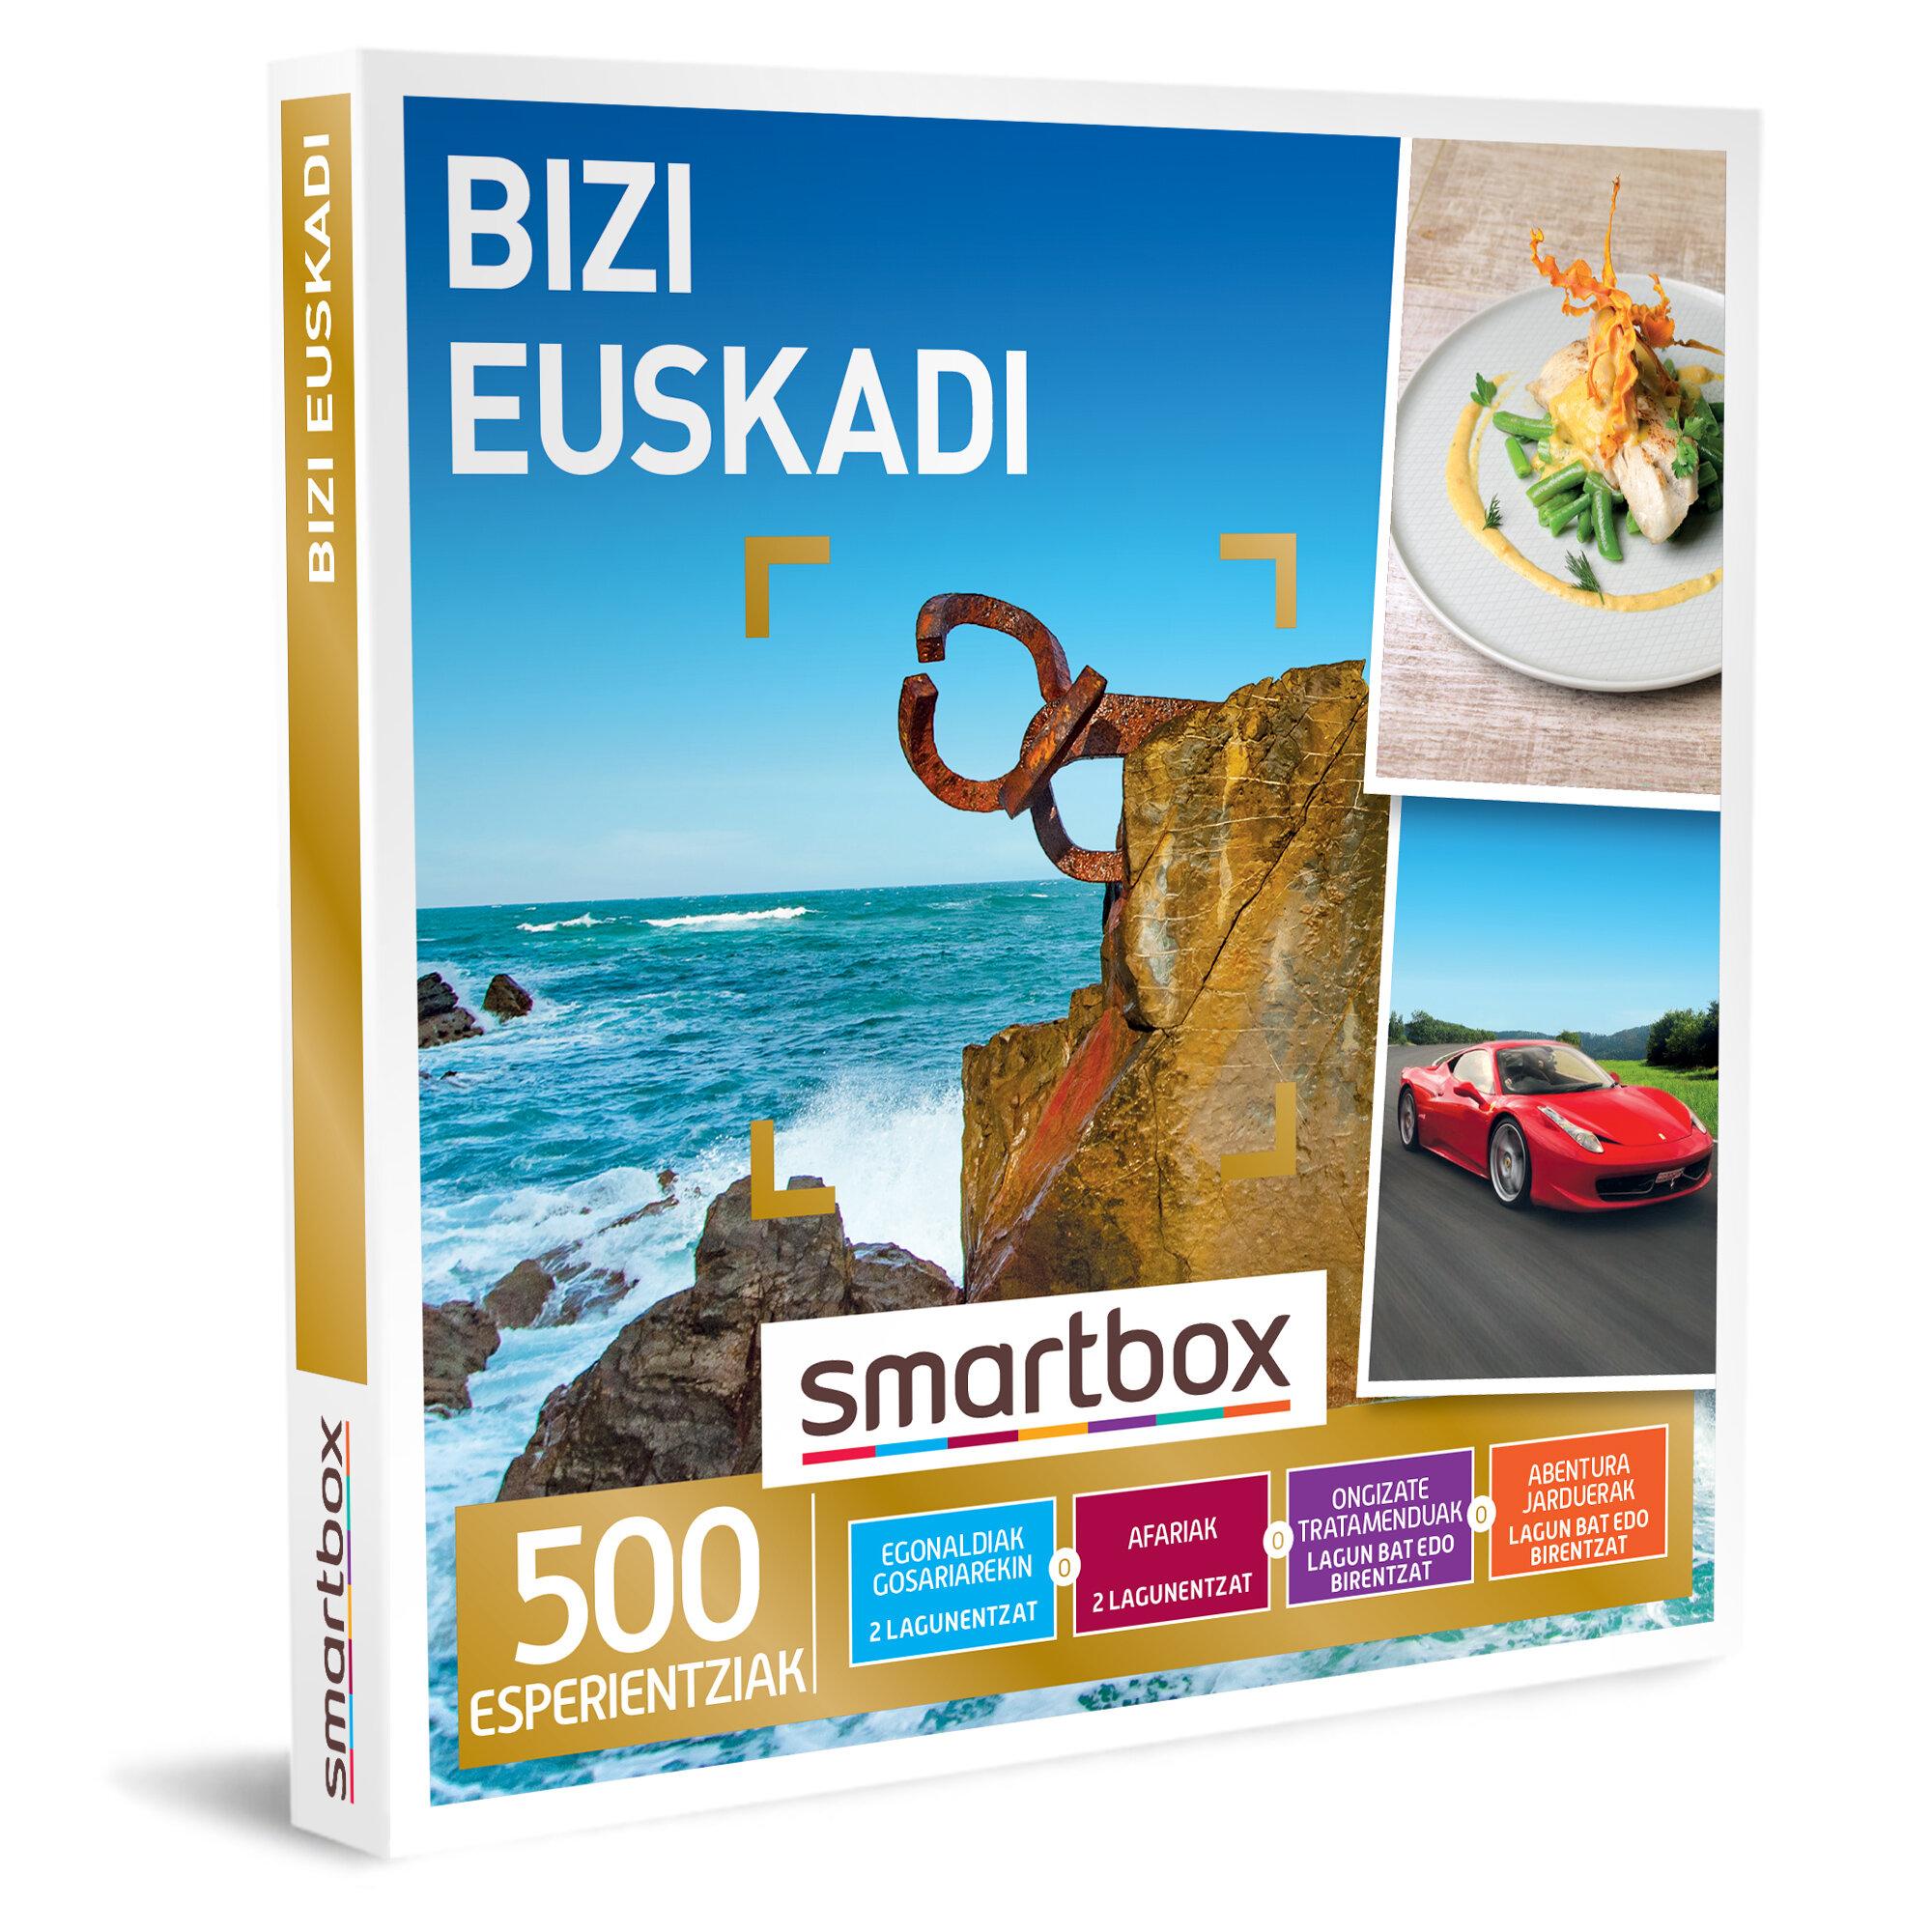 Smartbox |Bizi Euskadi